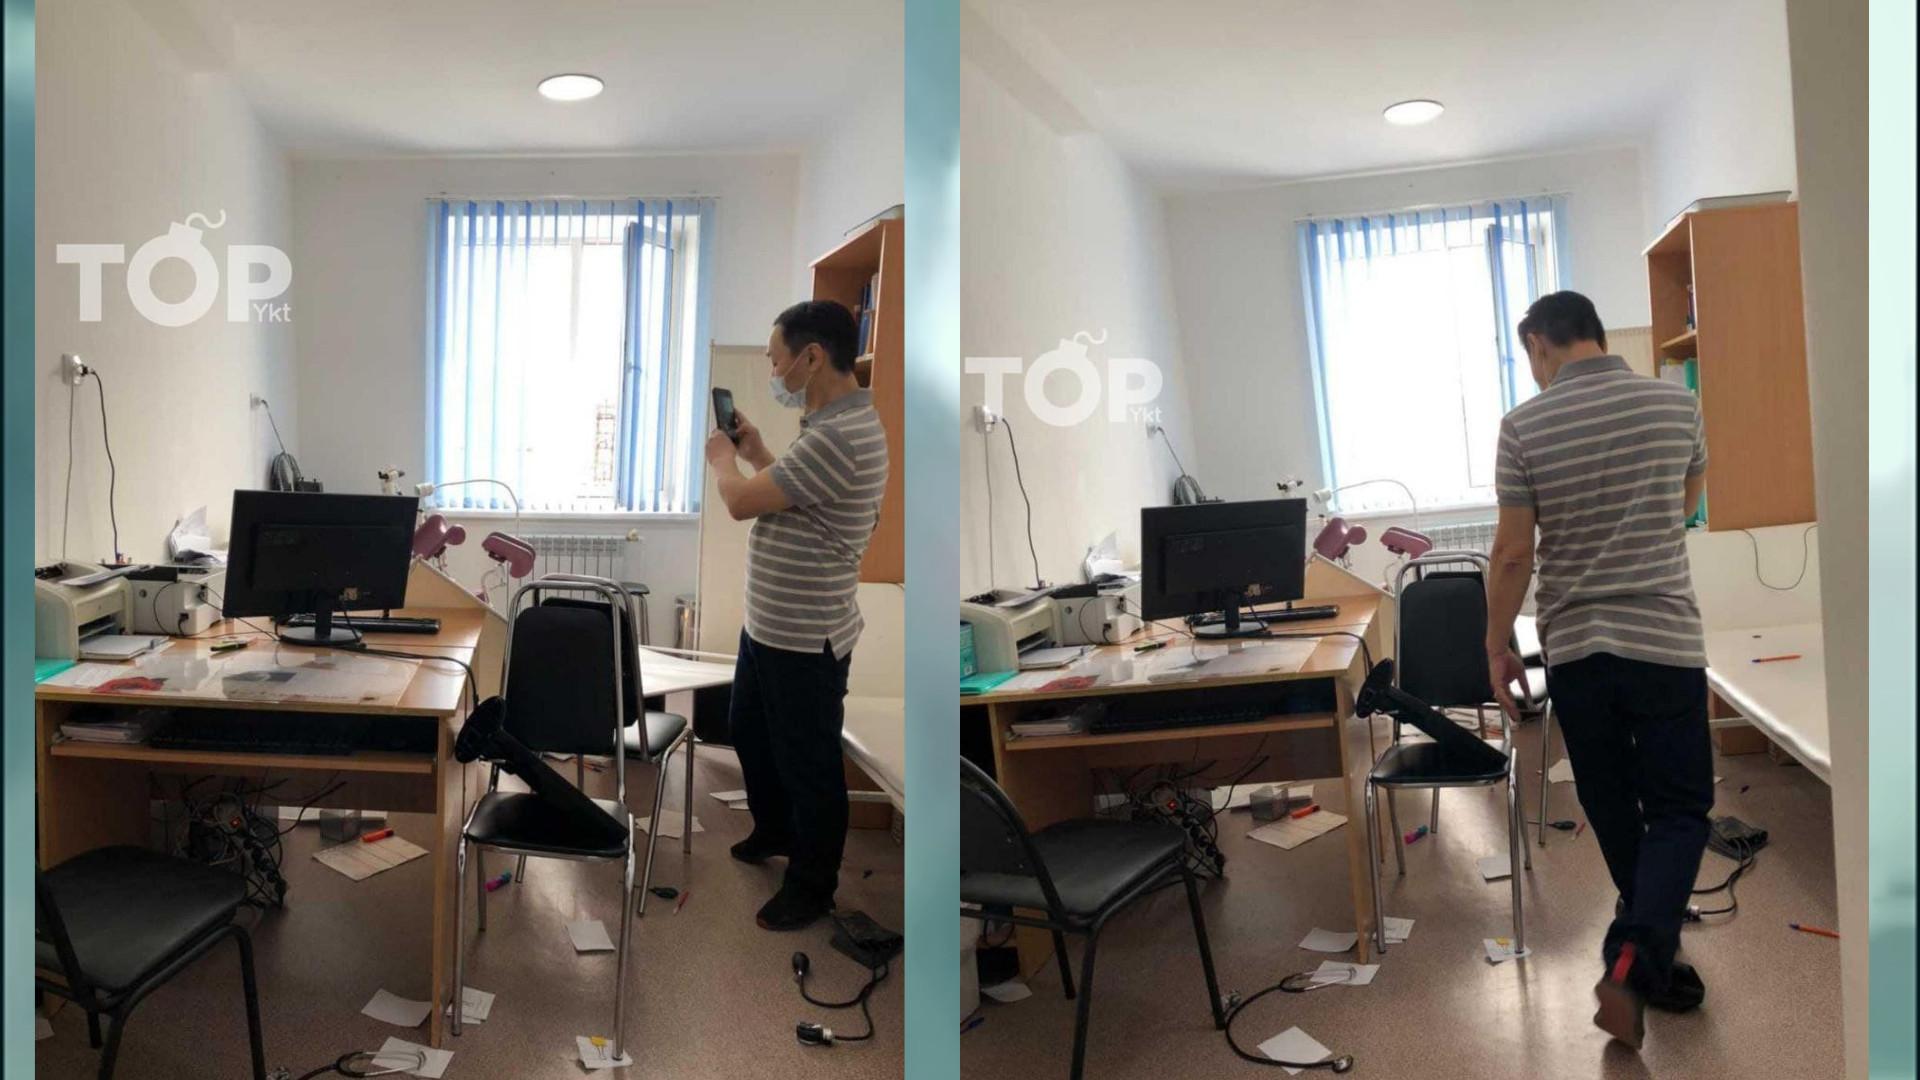 В Якутии женщина напала на врача и разнесла кабинет